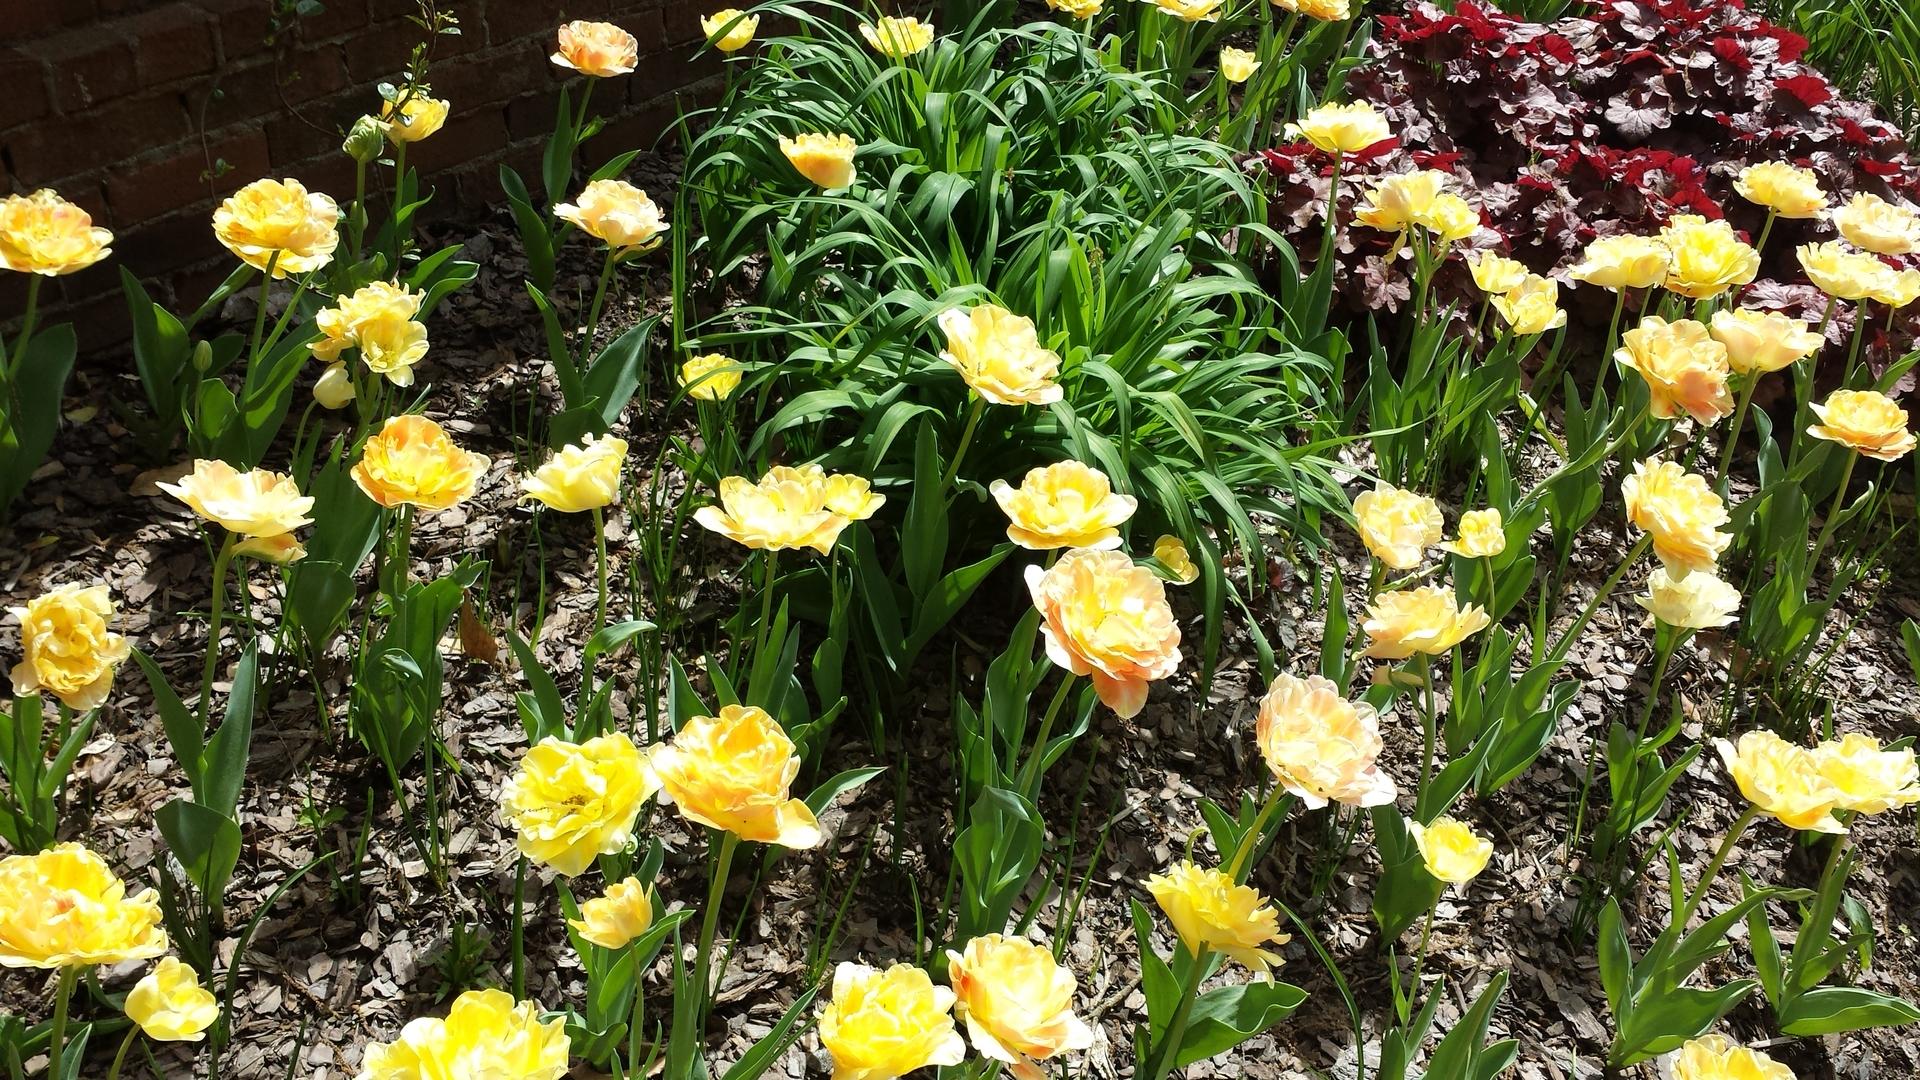 Nature, Flower, Garden, Flora, Floral